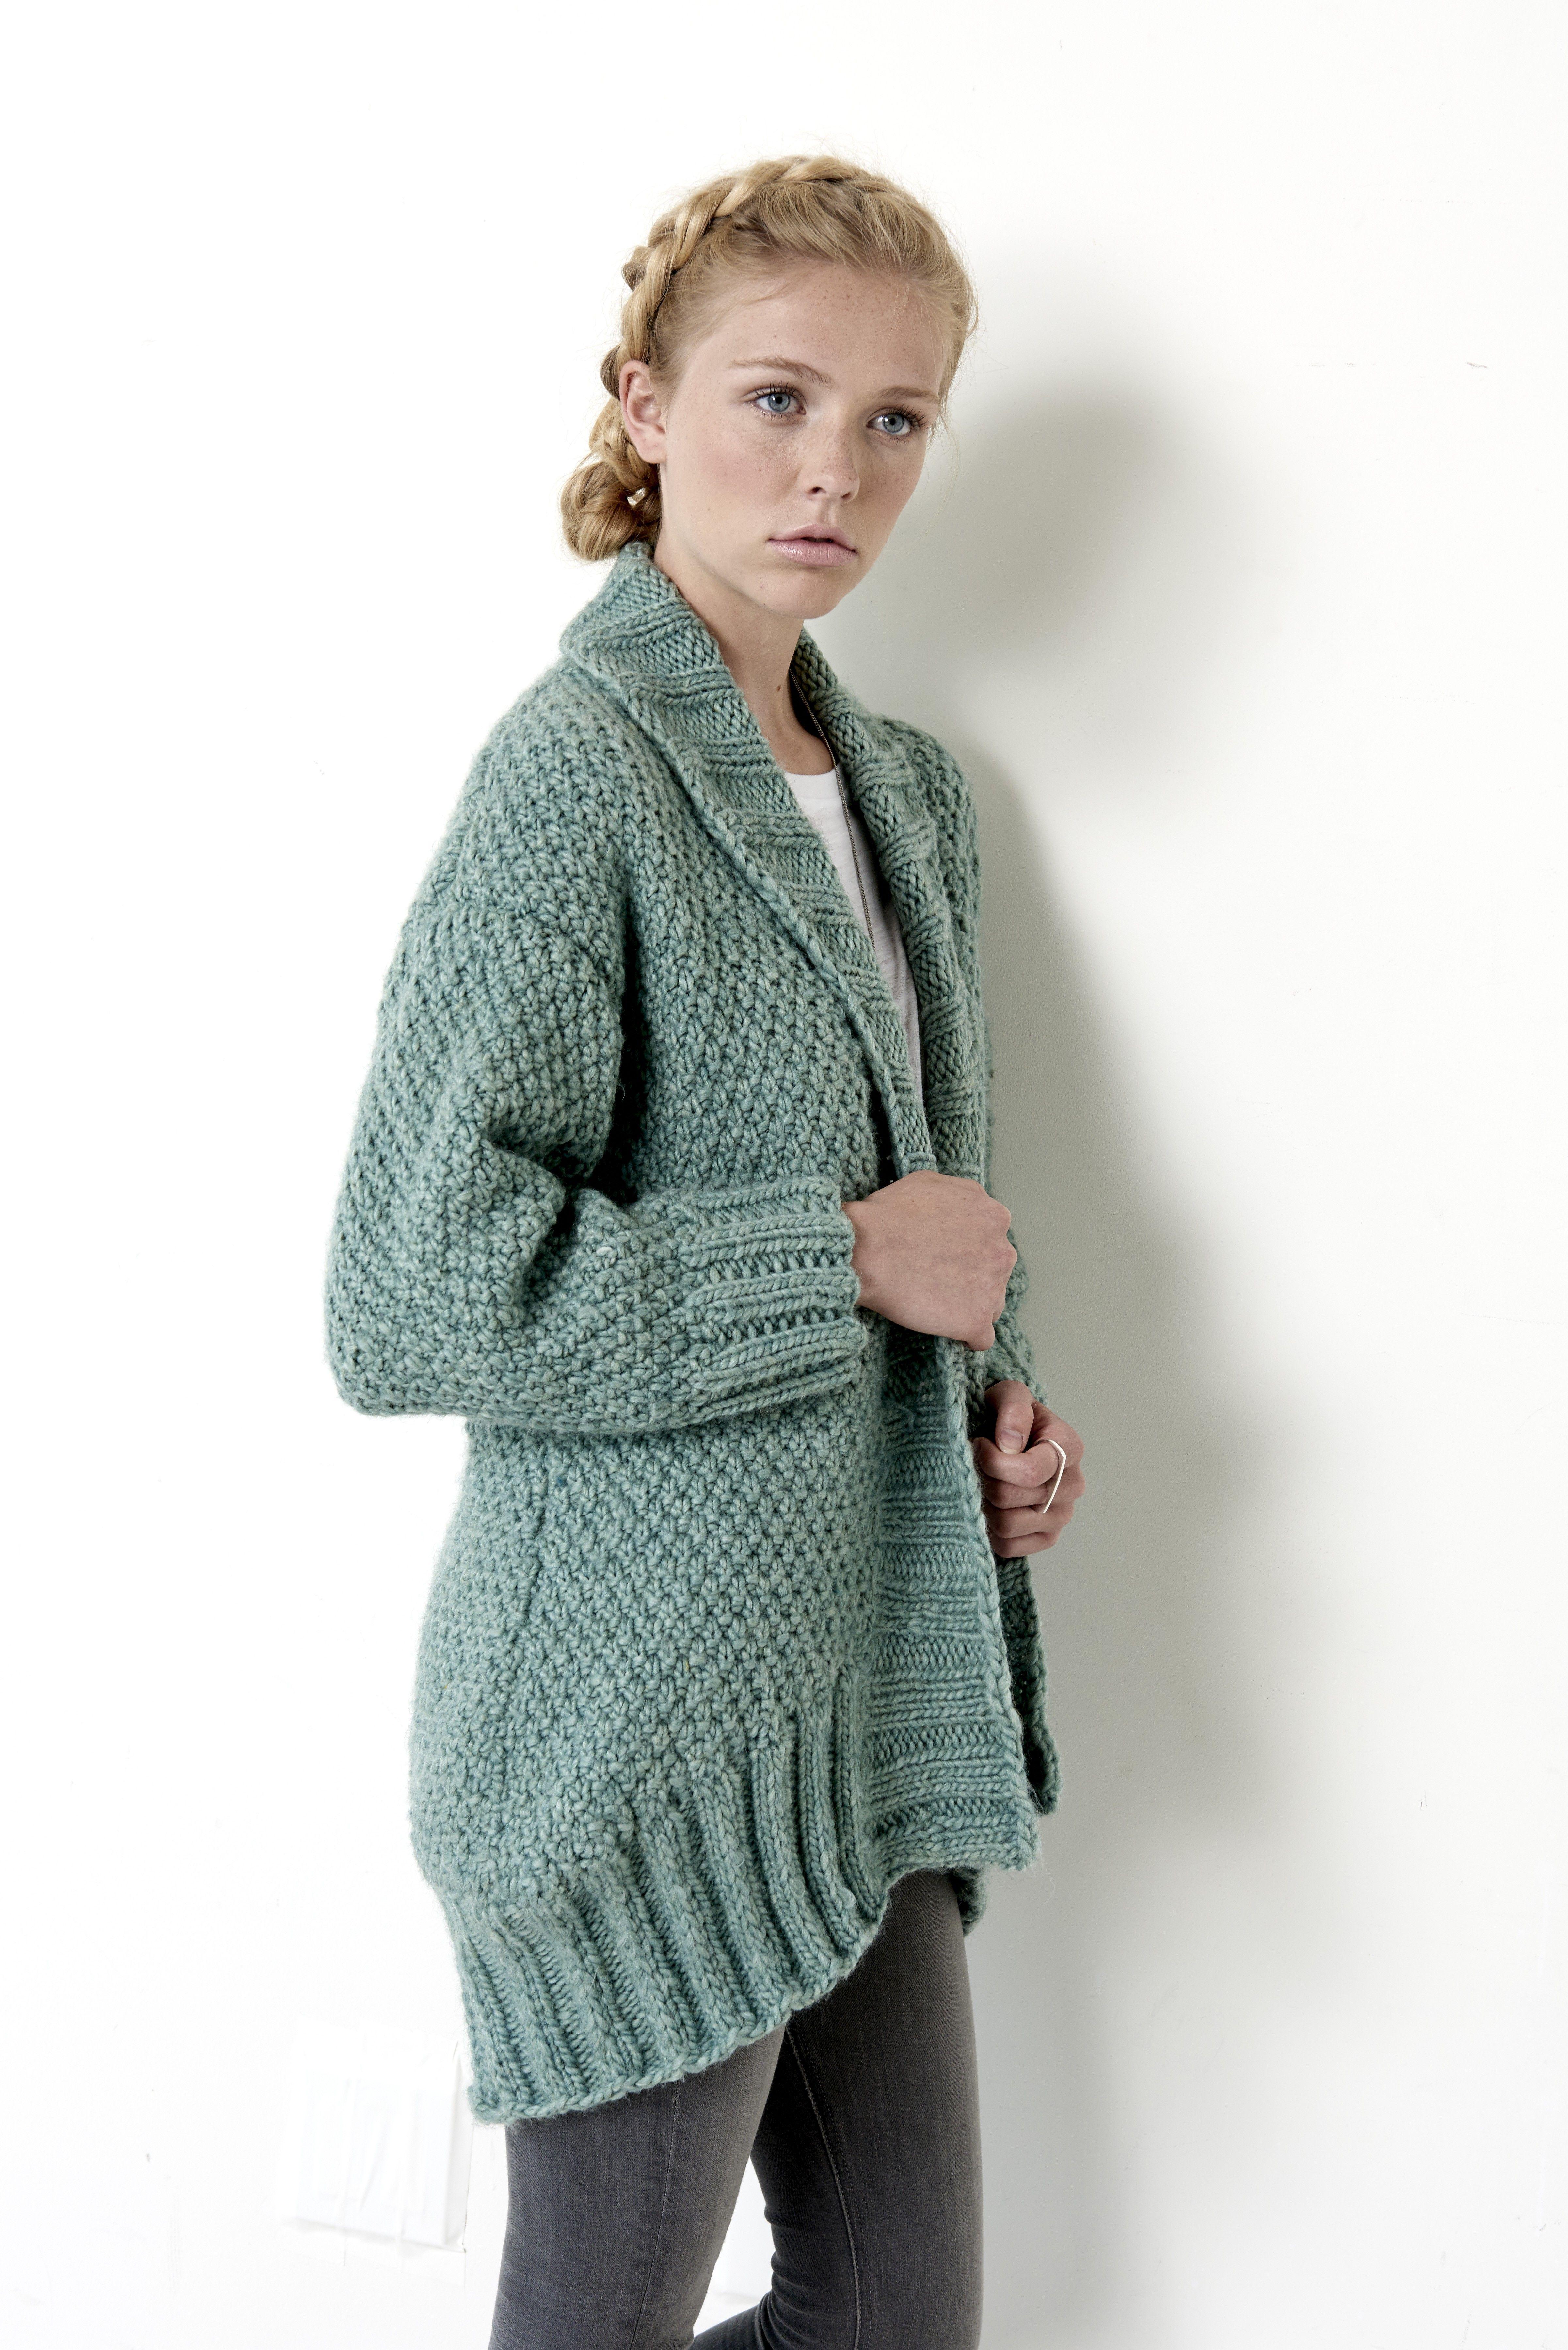 Knitting Cardigan Patterns : Cocoon cardigan patterns yarnspirations this cardi